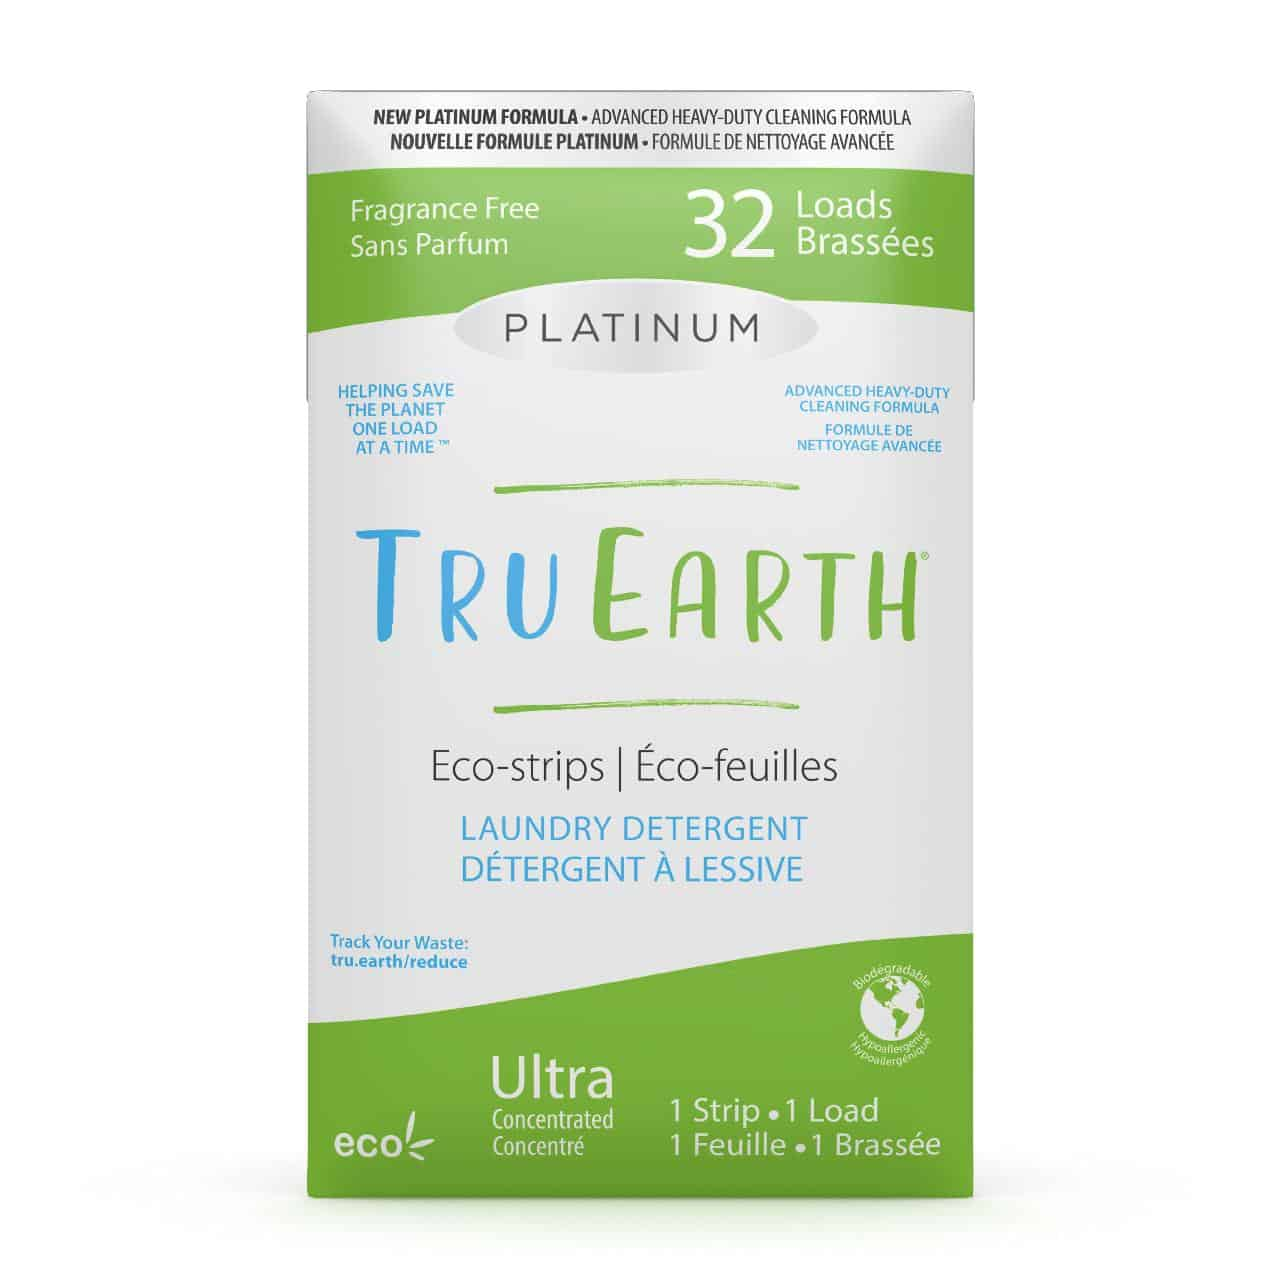 Tru Earth - Tru Earth Eco-strips Platinum Laundry Detergent (Fragrance-free) – 32 Loads | NOW: $21.95